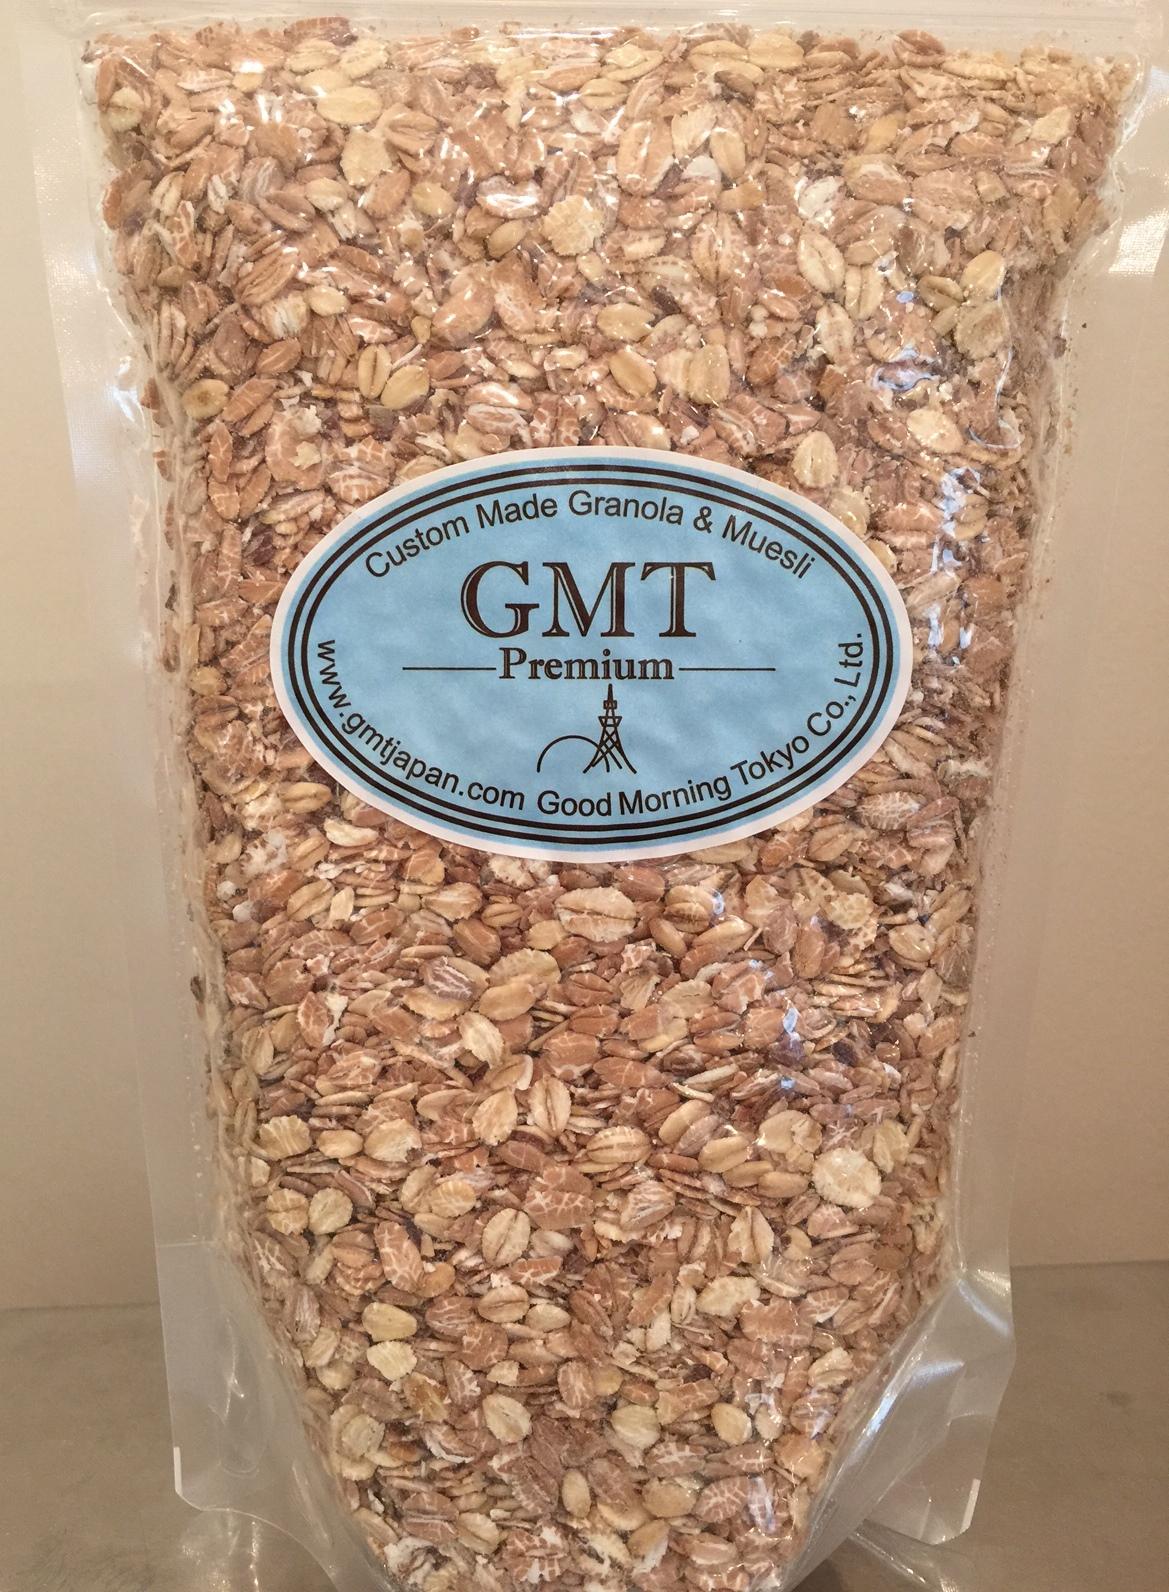 SALE◆3/31 8種雑穀フレーク・エイトグレインミックス * 8 Grain Mix 500g